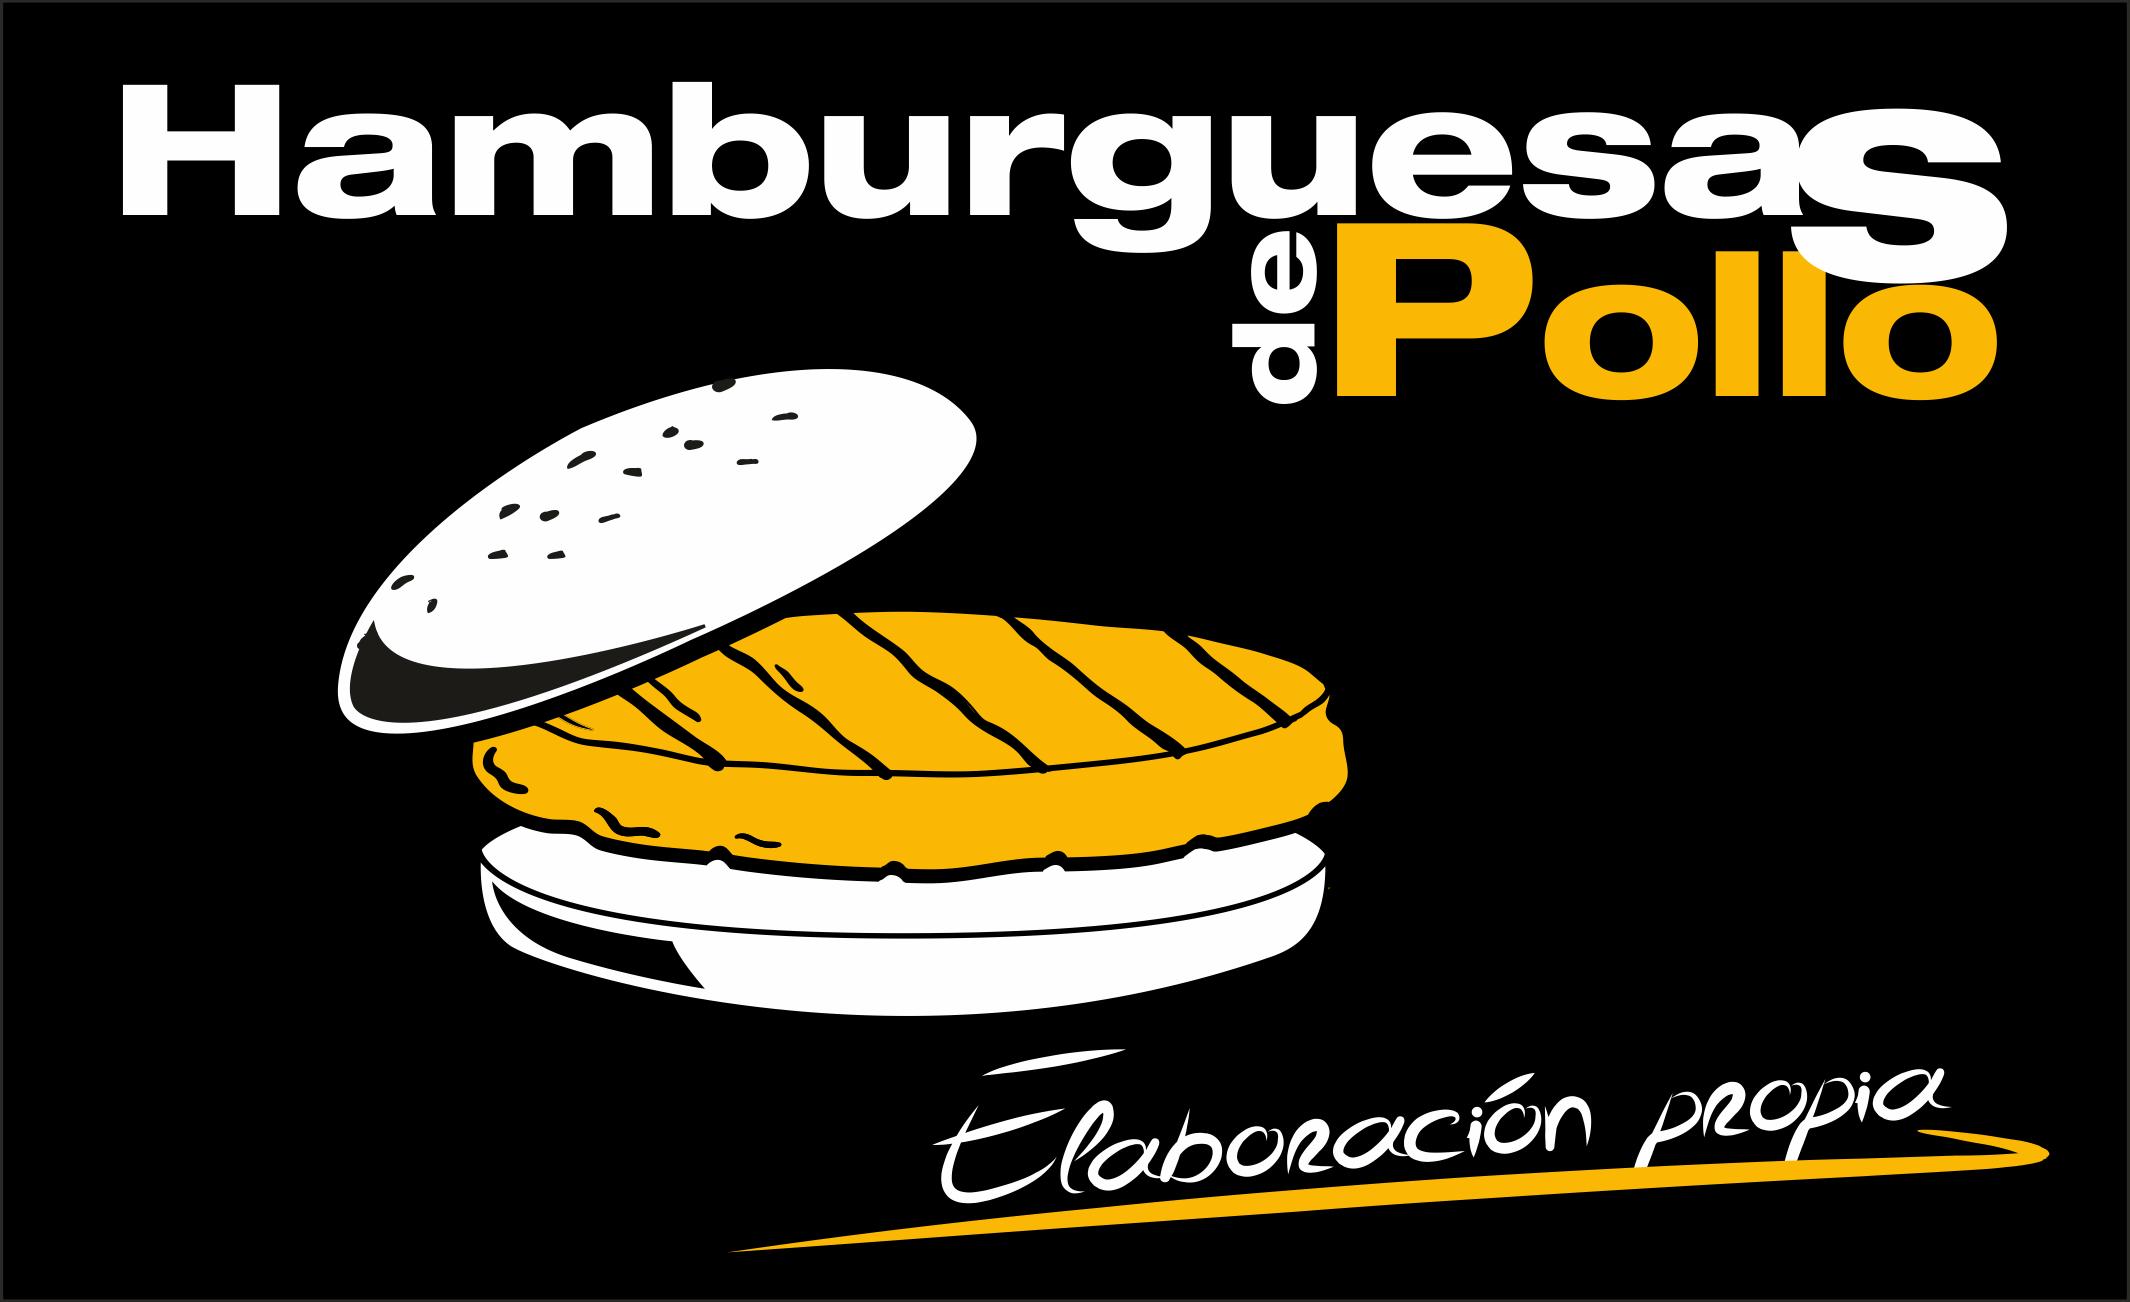 burgerspollo